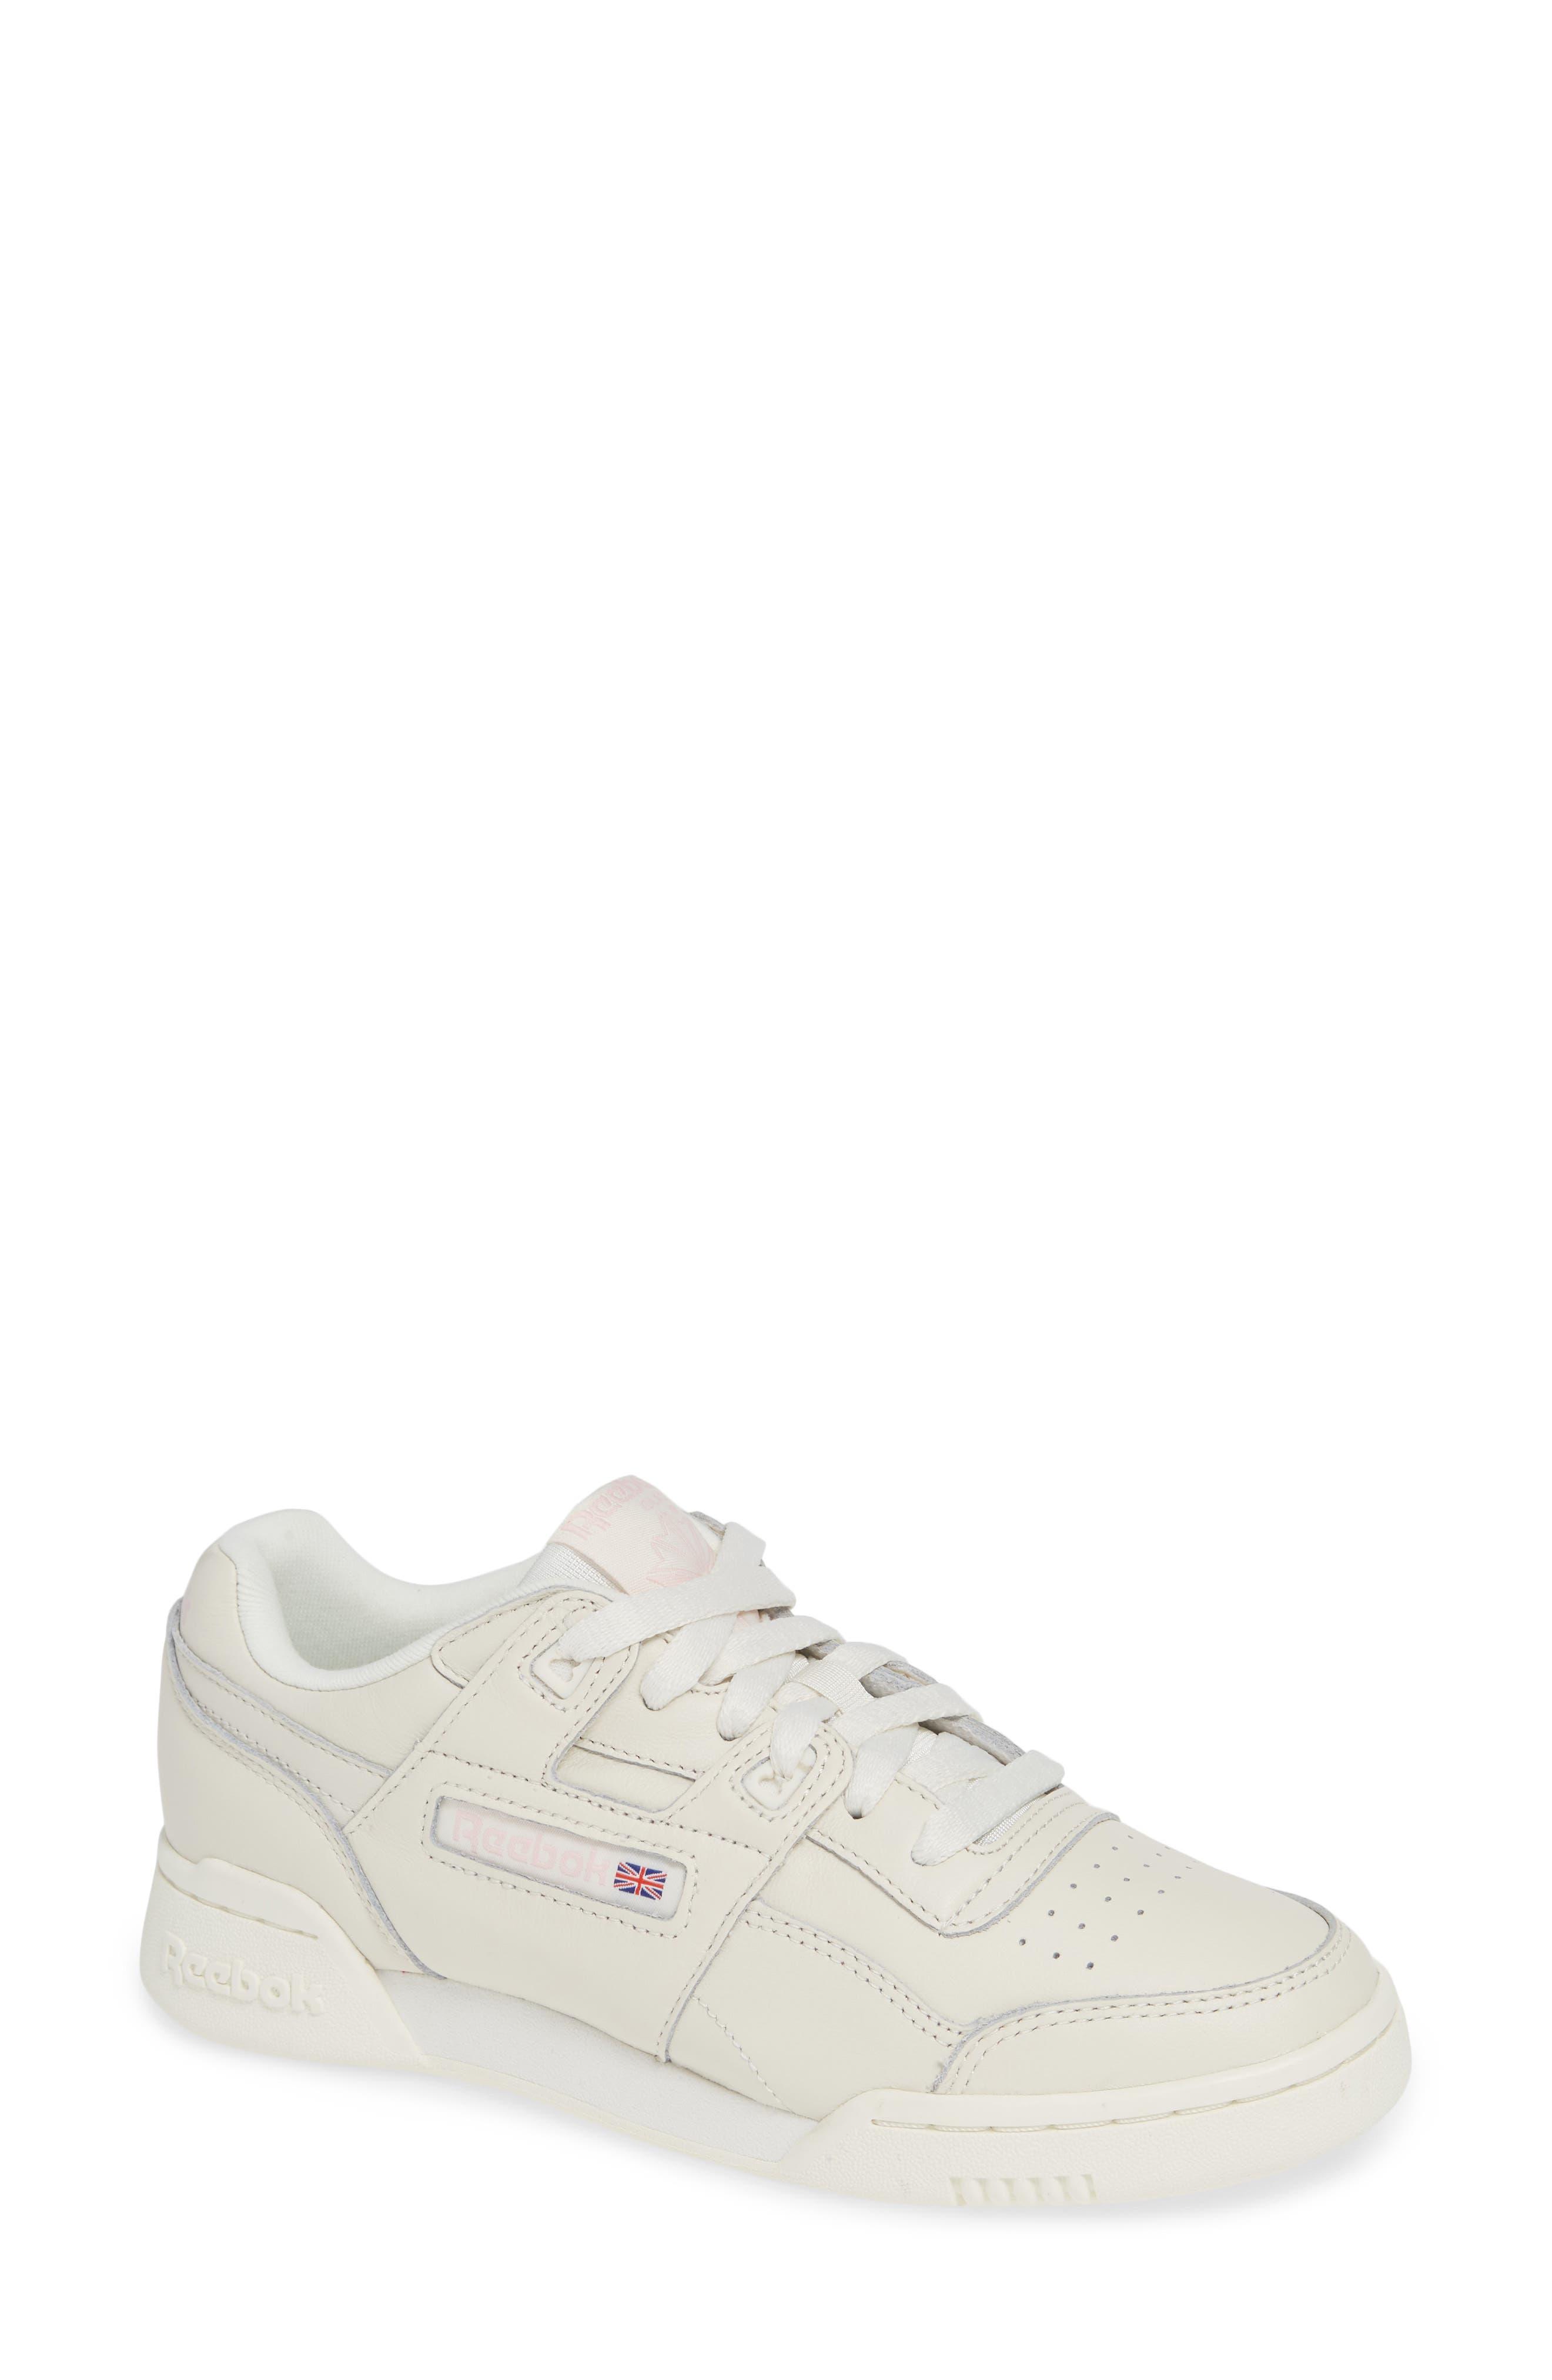 Workout Low Plus Sneaker,                             Main thumbnail 1, color,                             WHITE/ PRACTICAL PINK